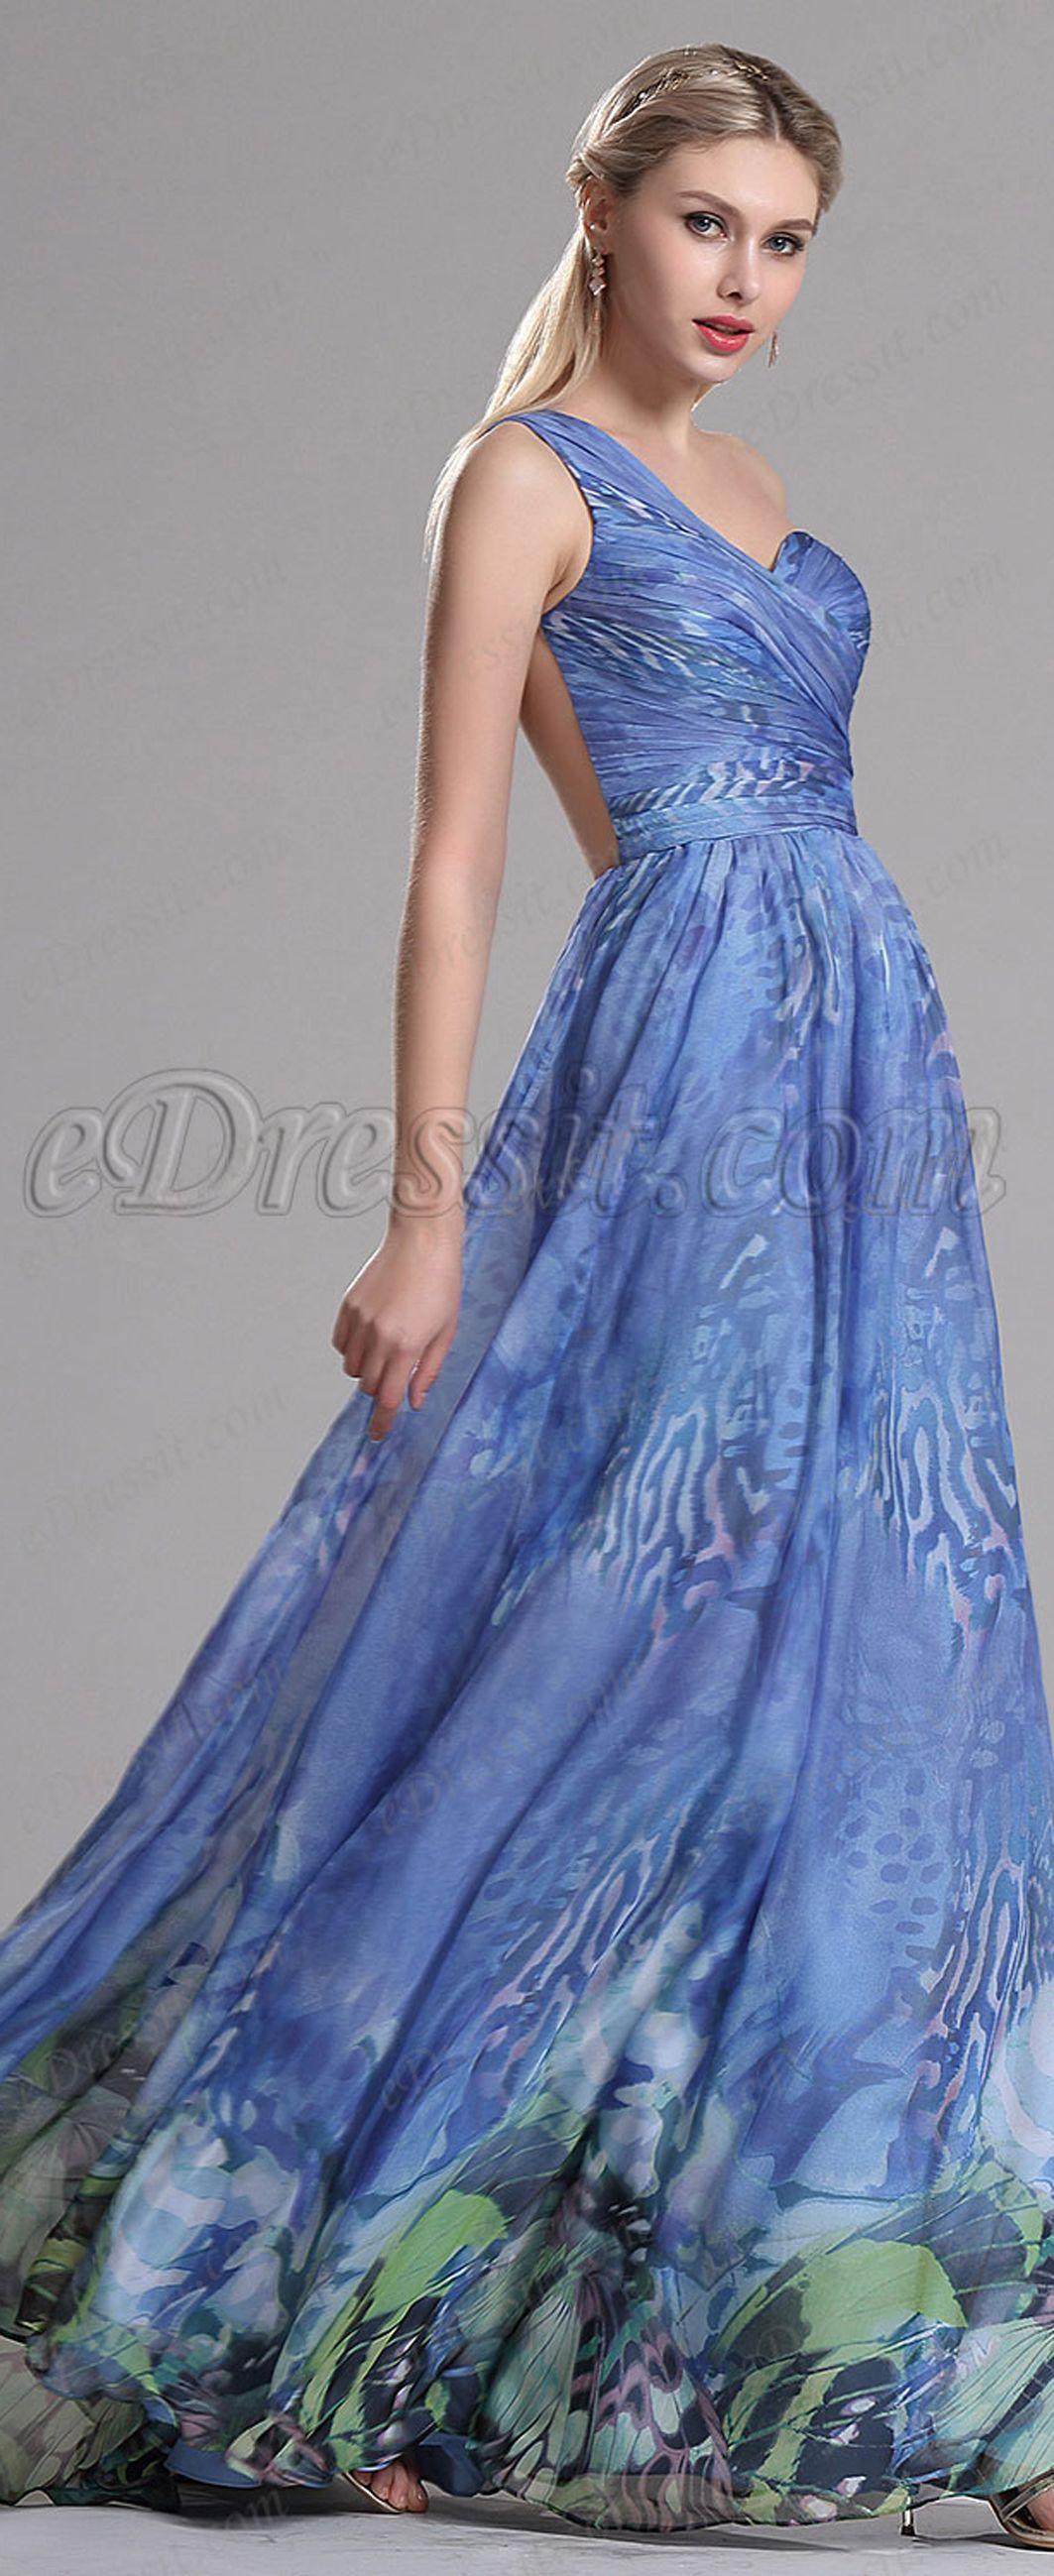 Edressit one shoulder blue prom dress evening gown ever new